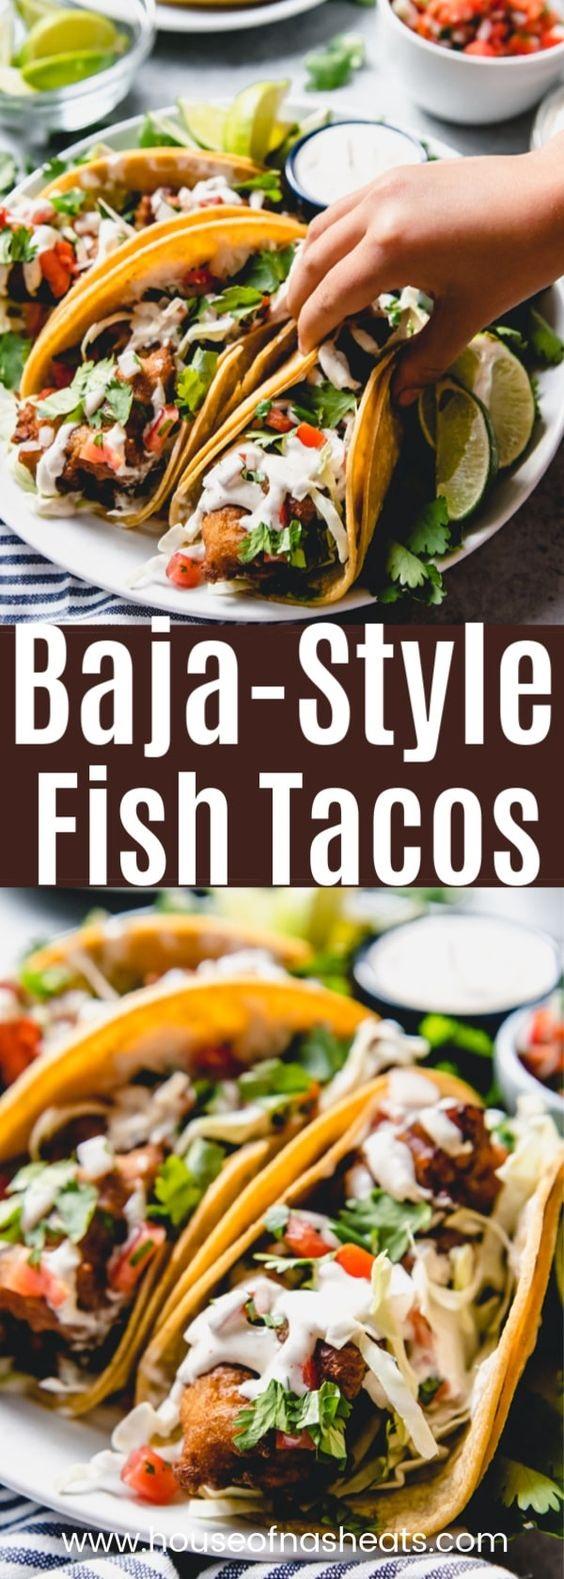 Baja Fish Tacos Recipe